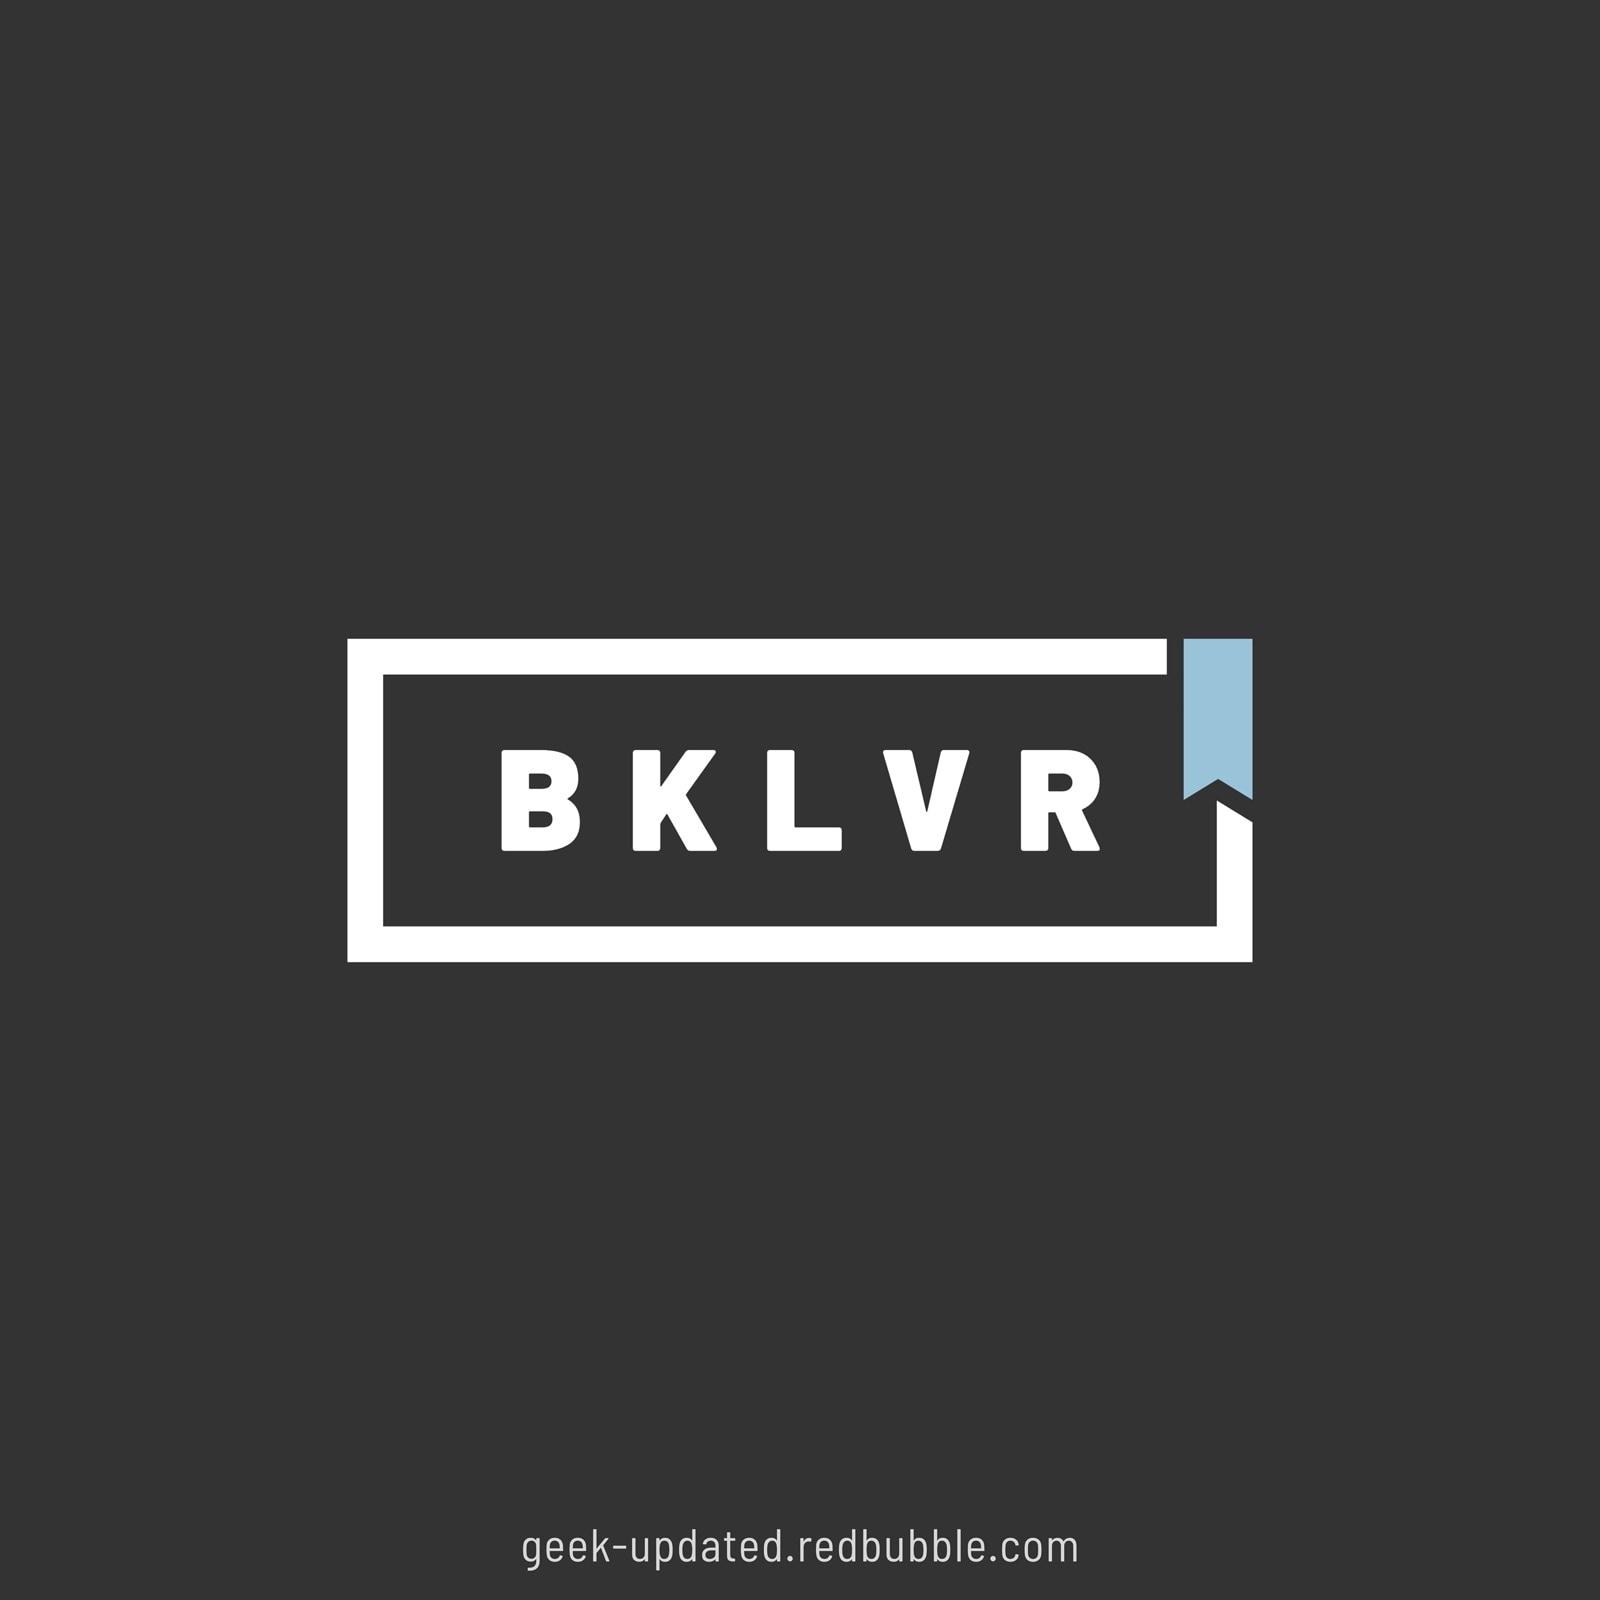 BKLVR - booklover - design by Piotr Kowalczyk